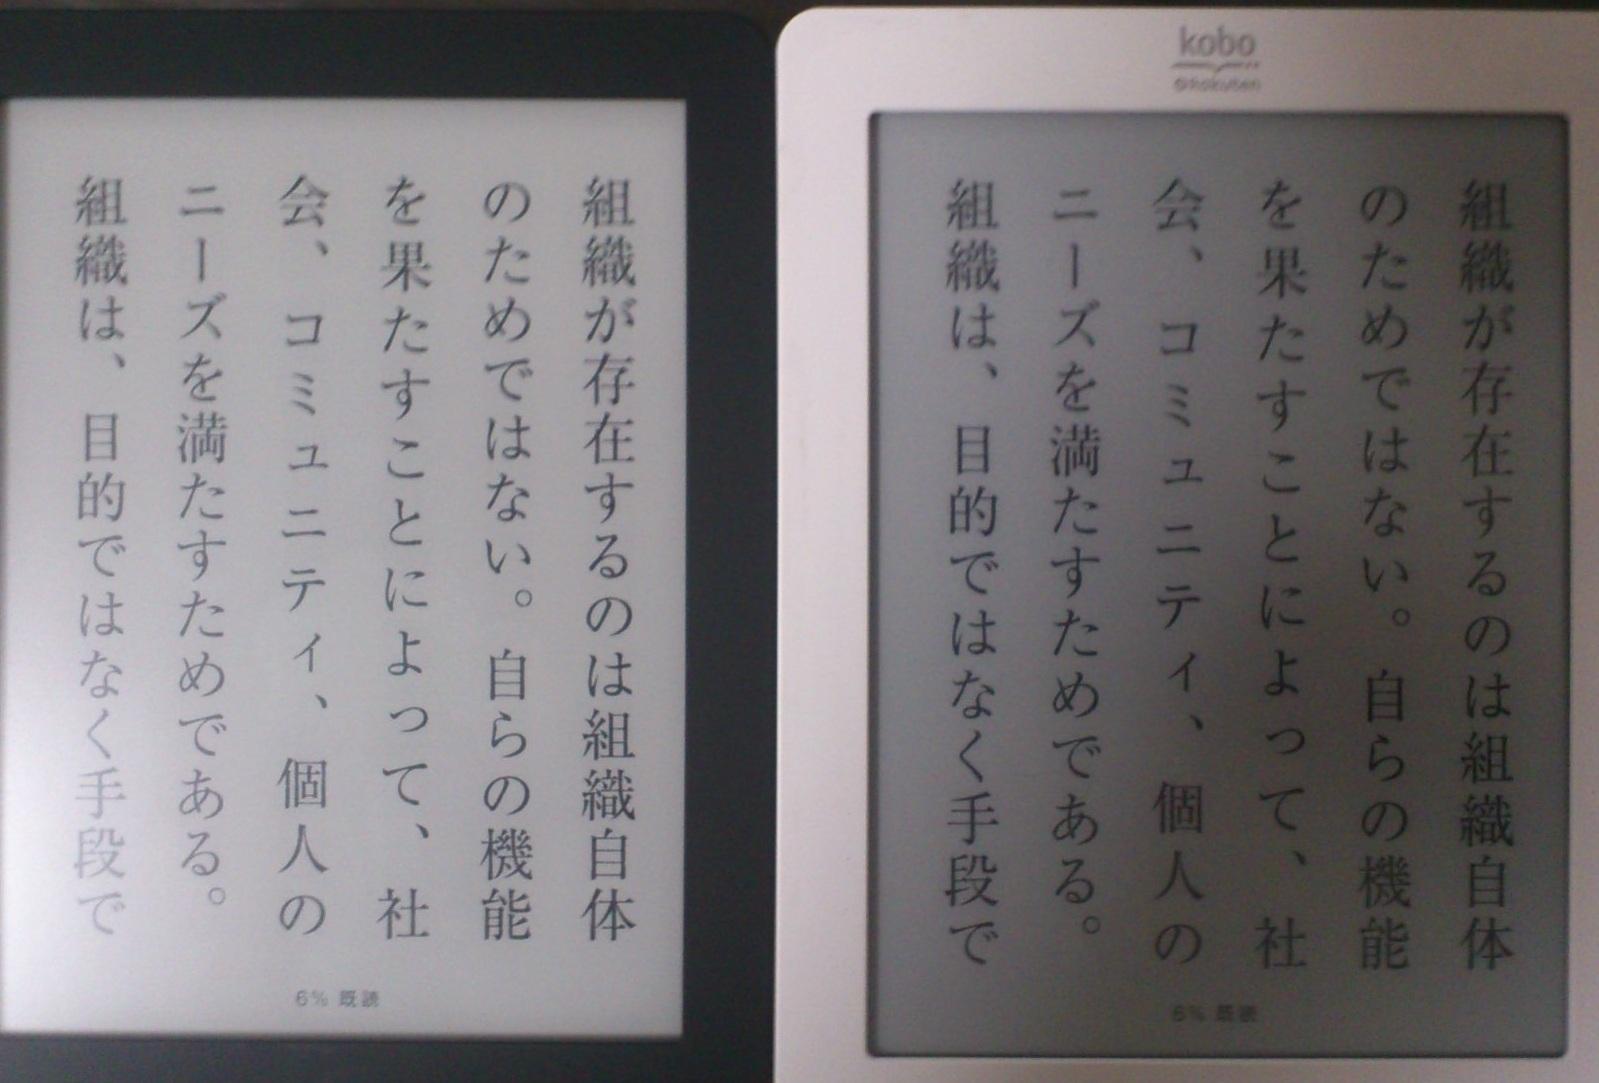 kobo touch glo 文字の鮮明さ 違いは何?